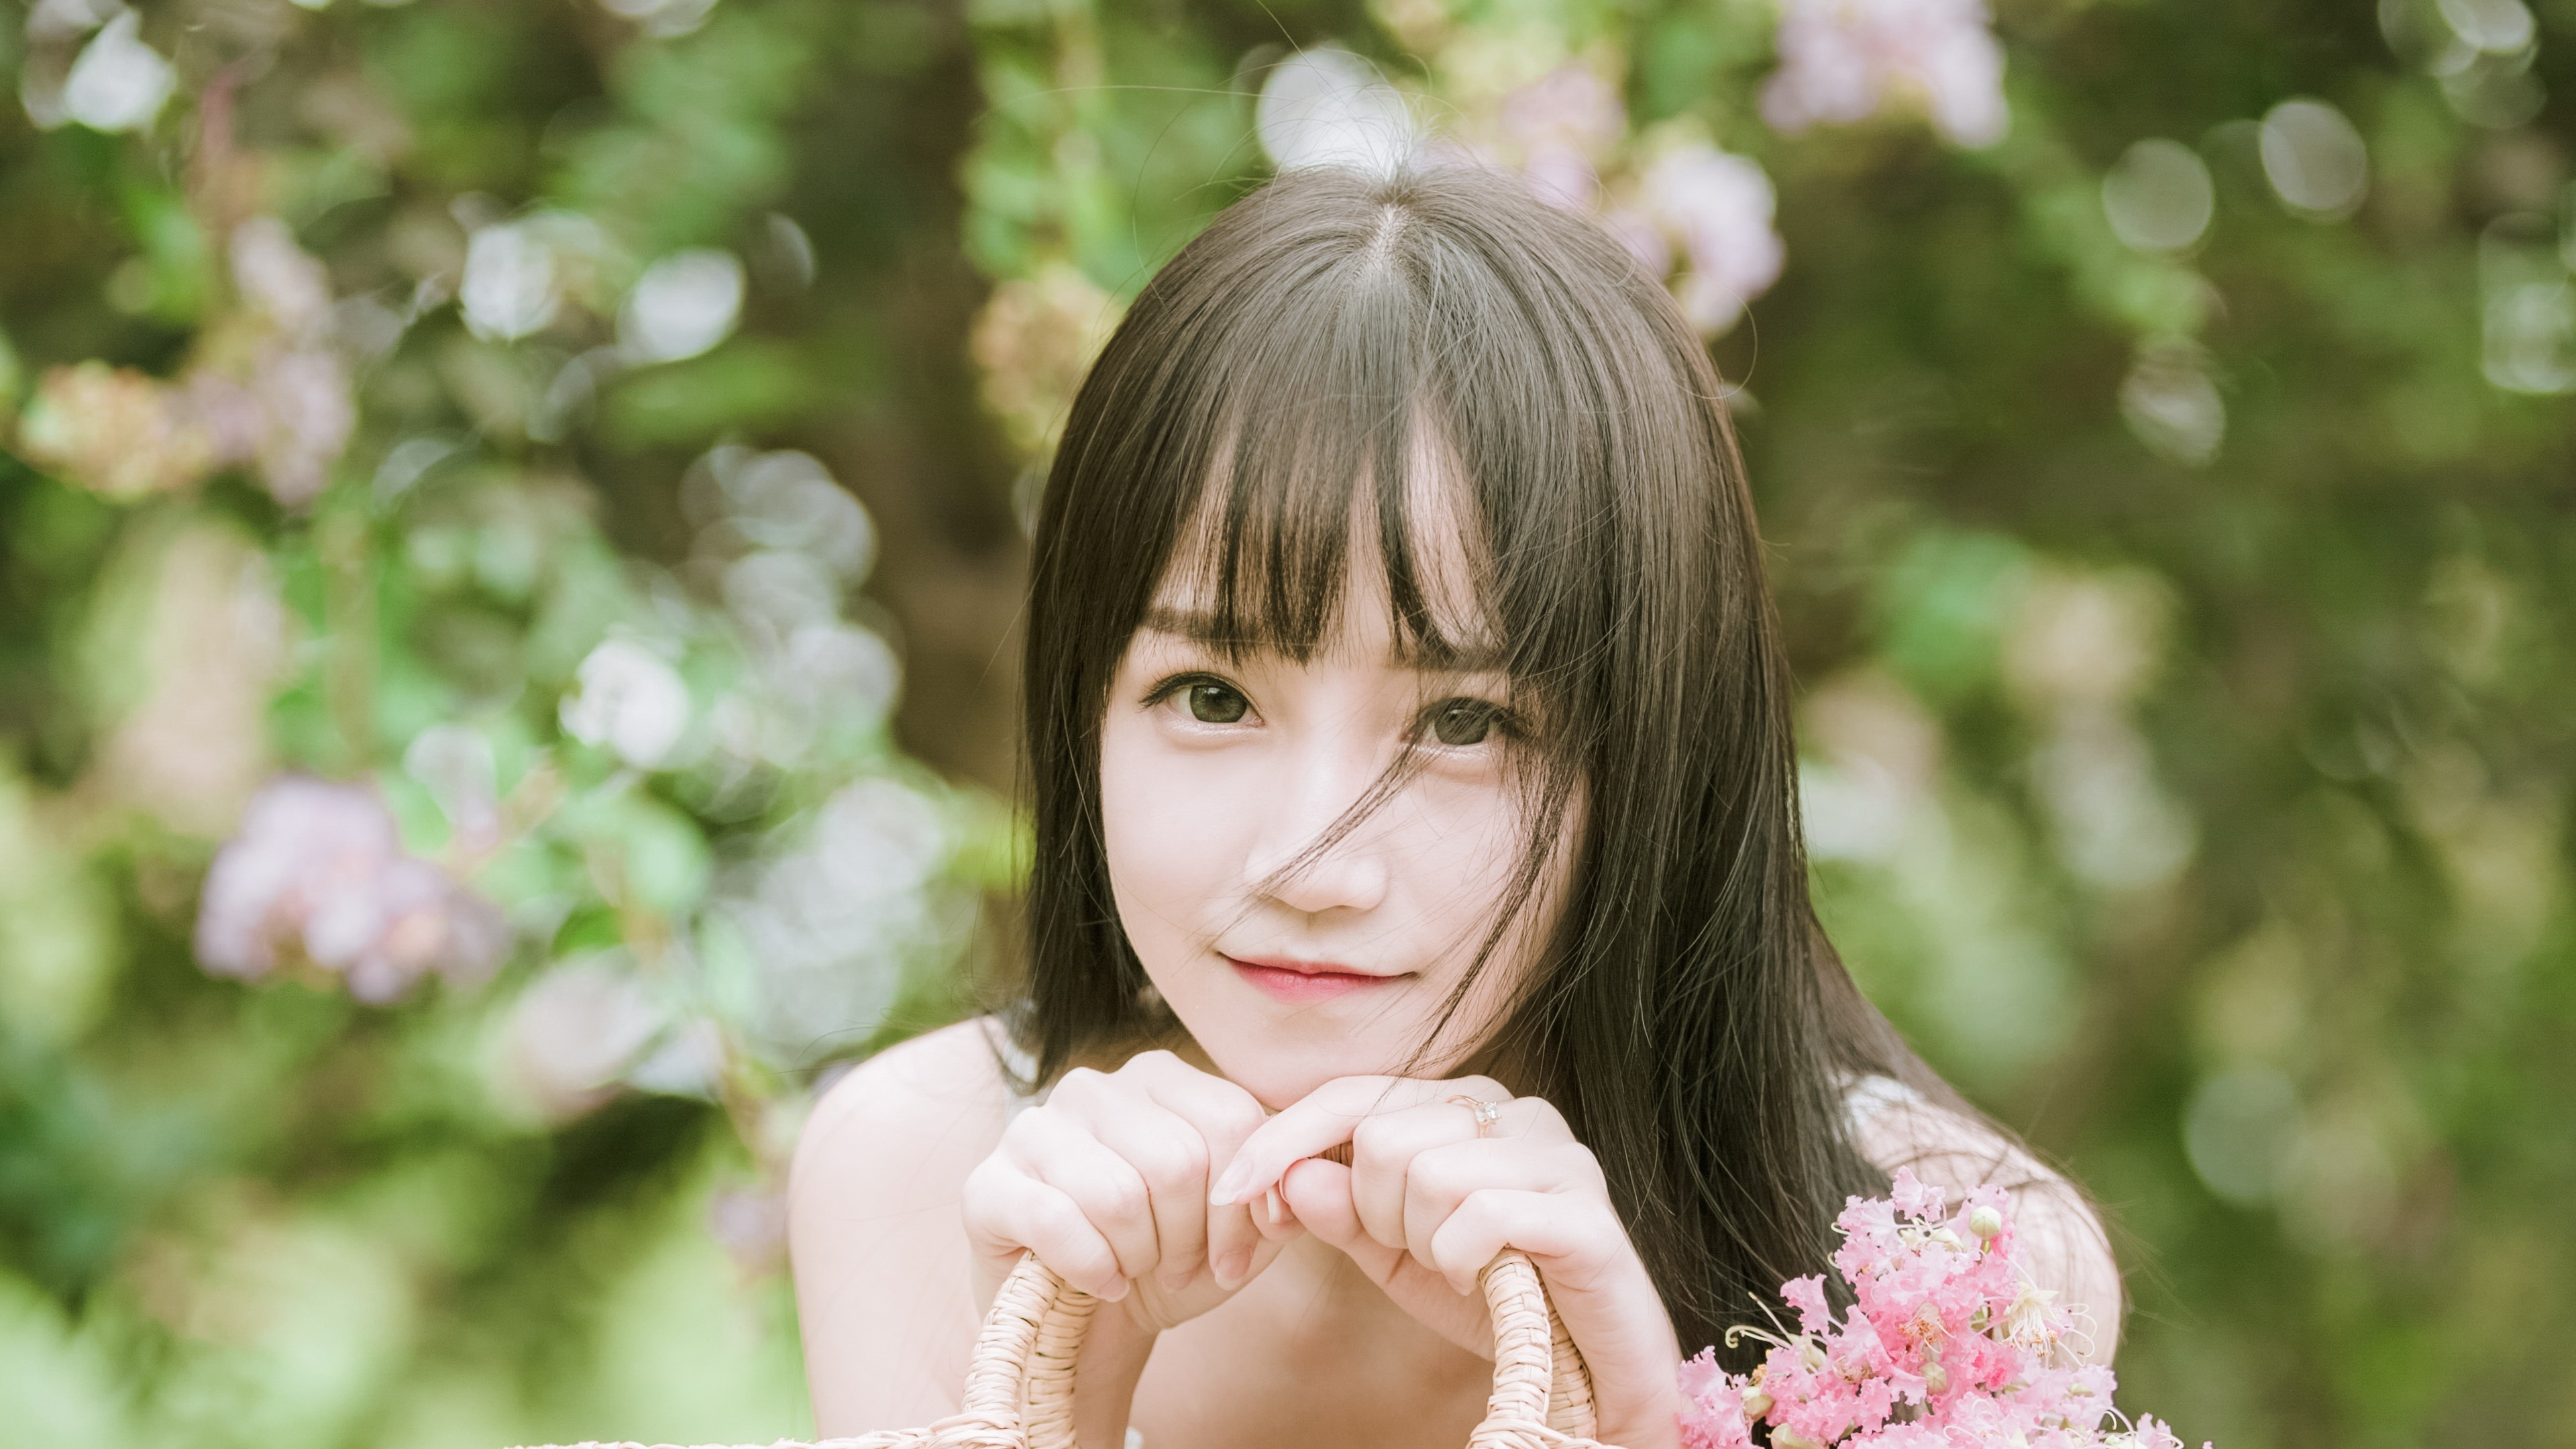 Pure japanese beauty, hugh hefner and naked girlfriends fingering